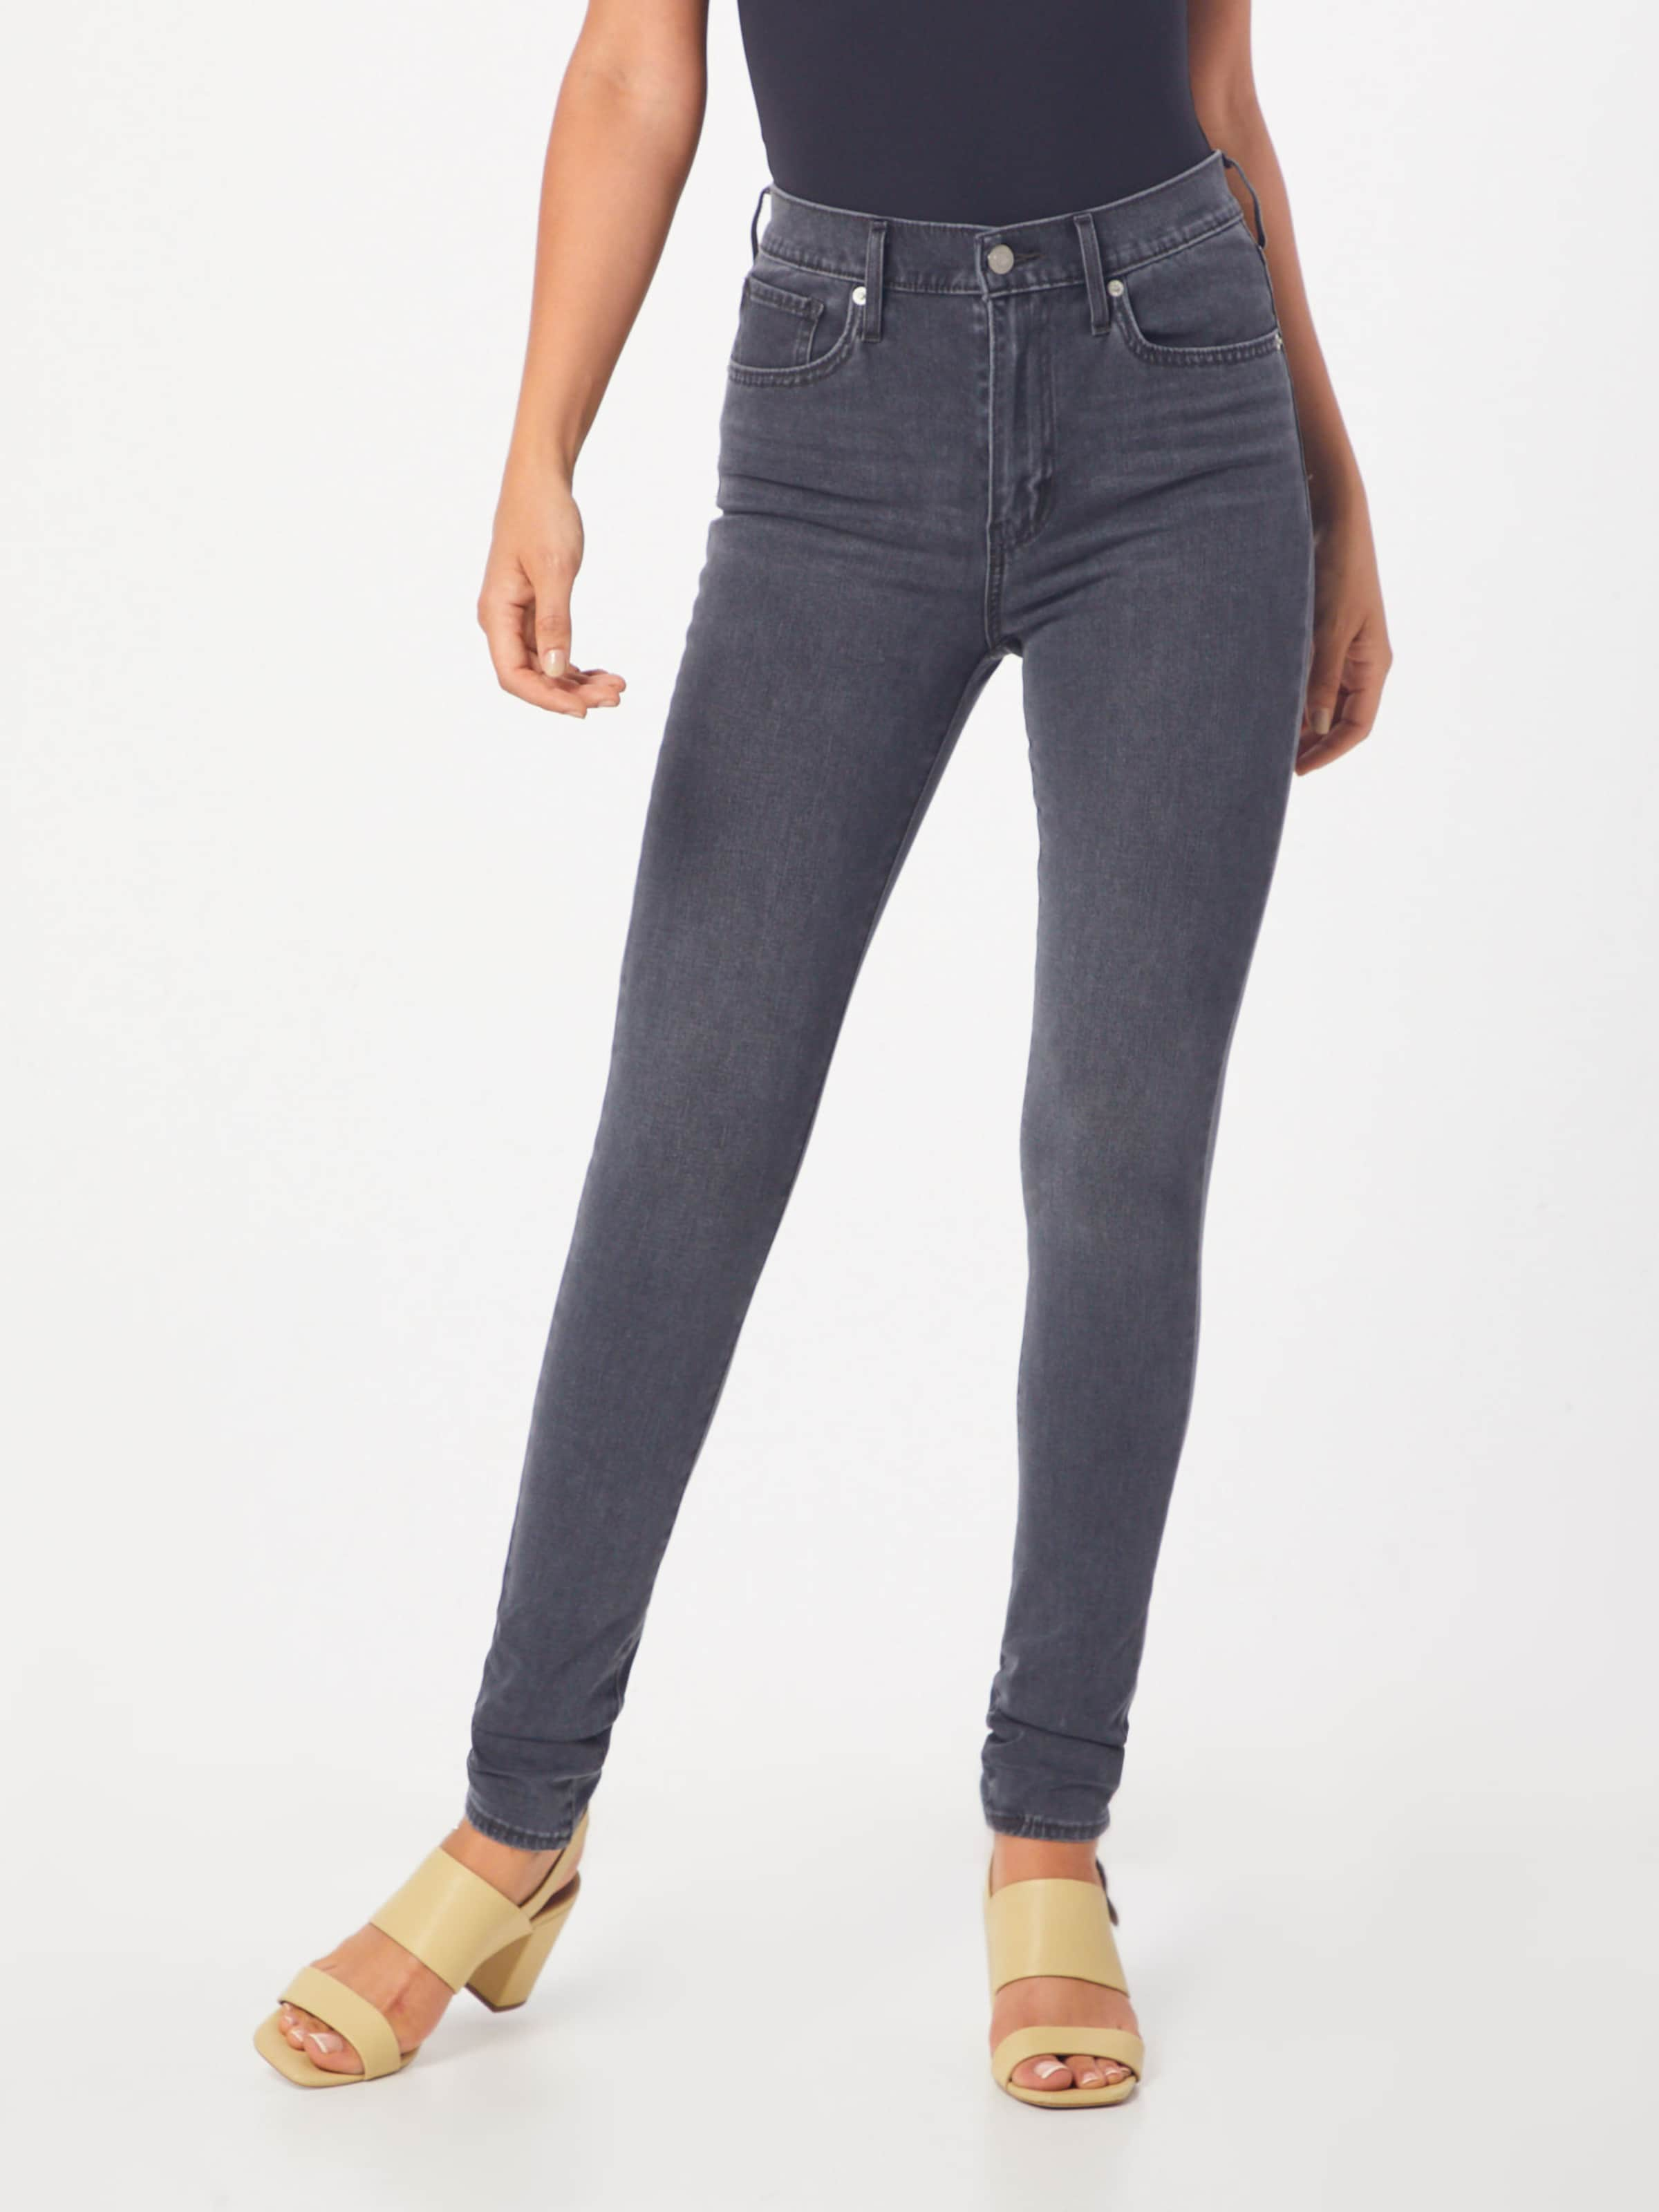 'mile Grey Levi's In Denim Jeans High' mNw8Ovn0